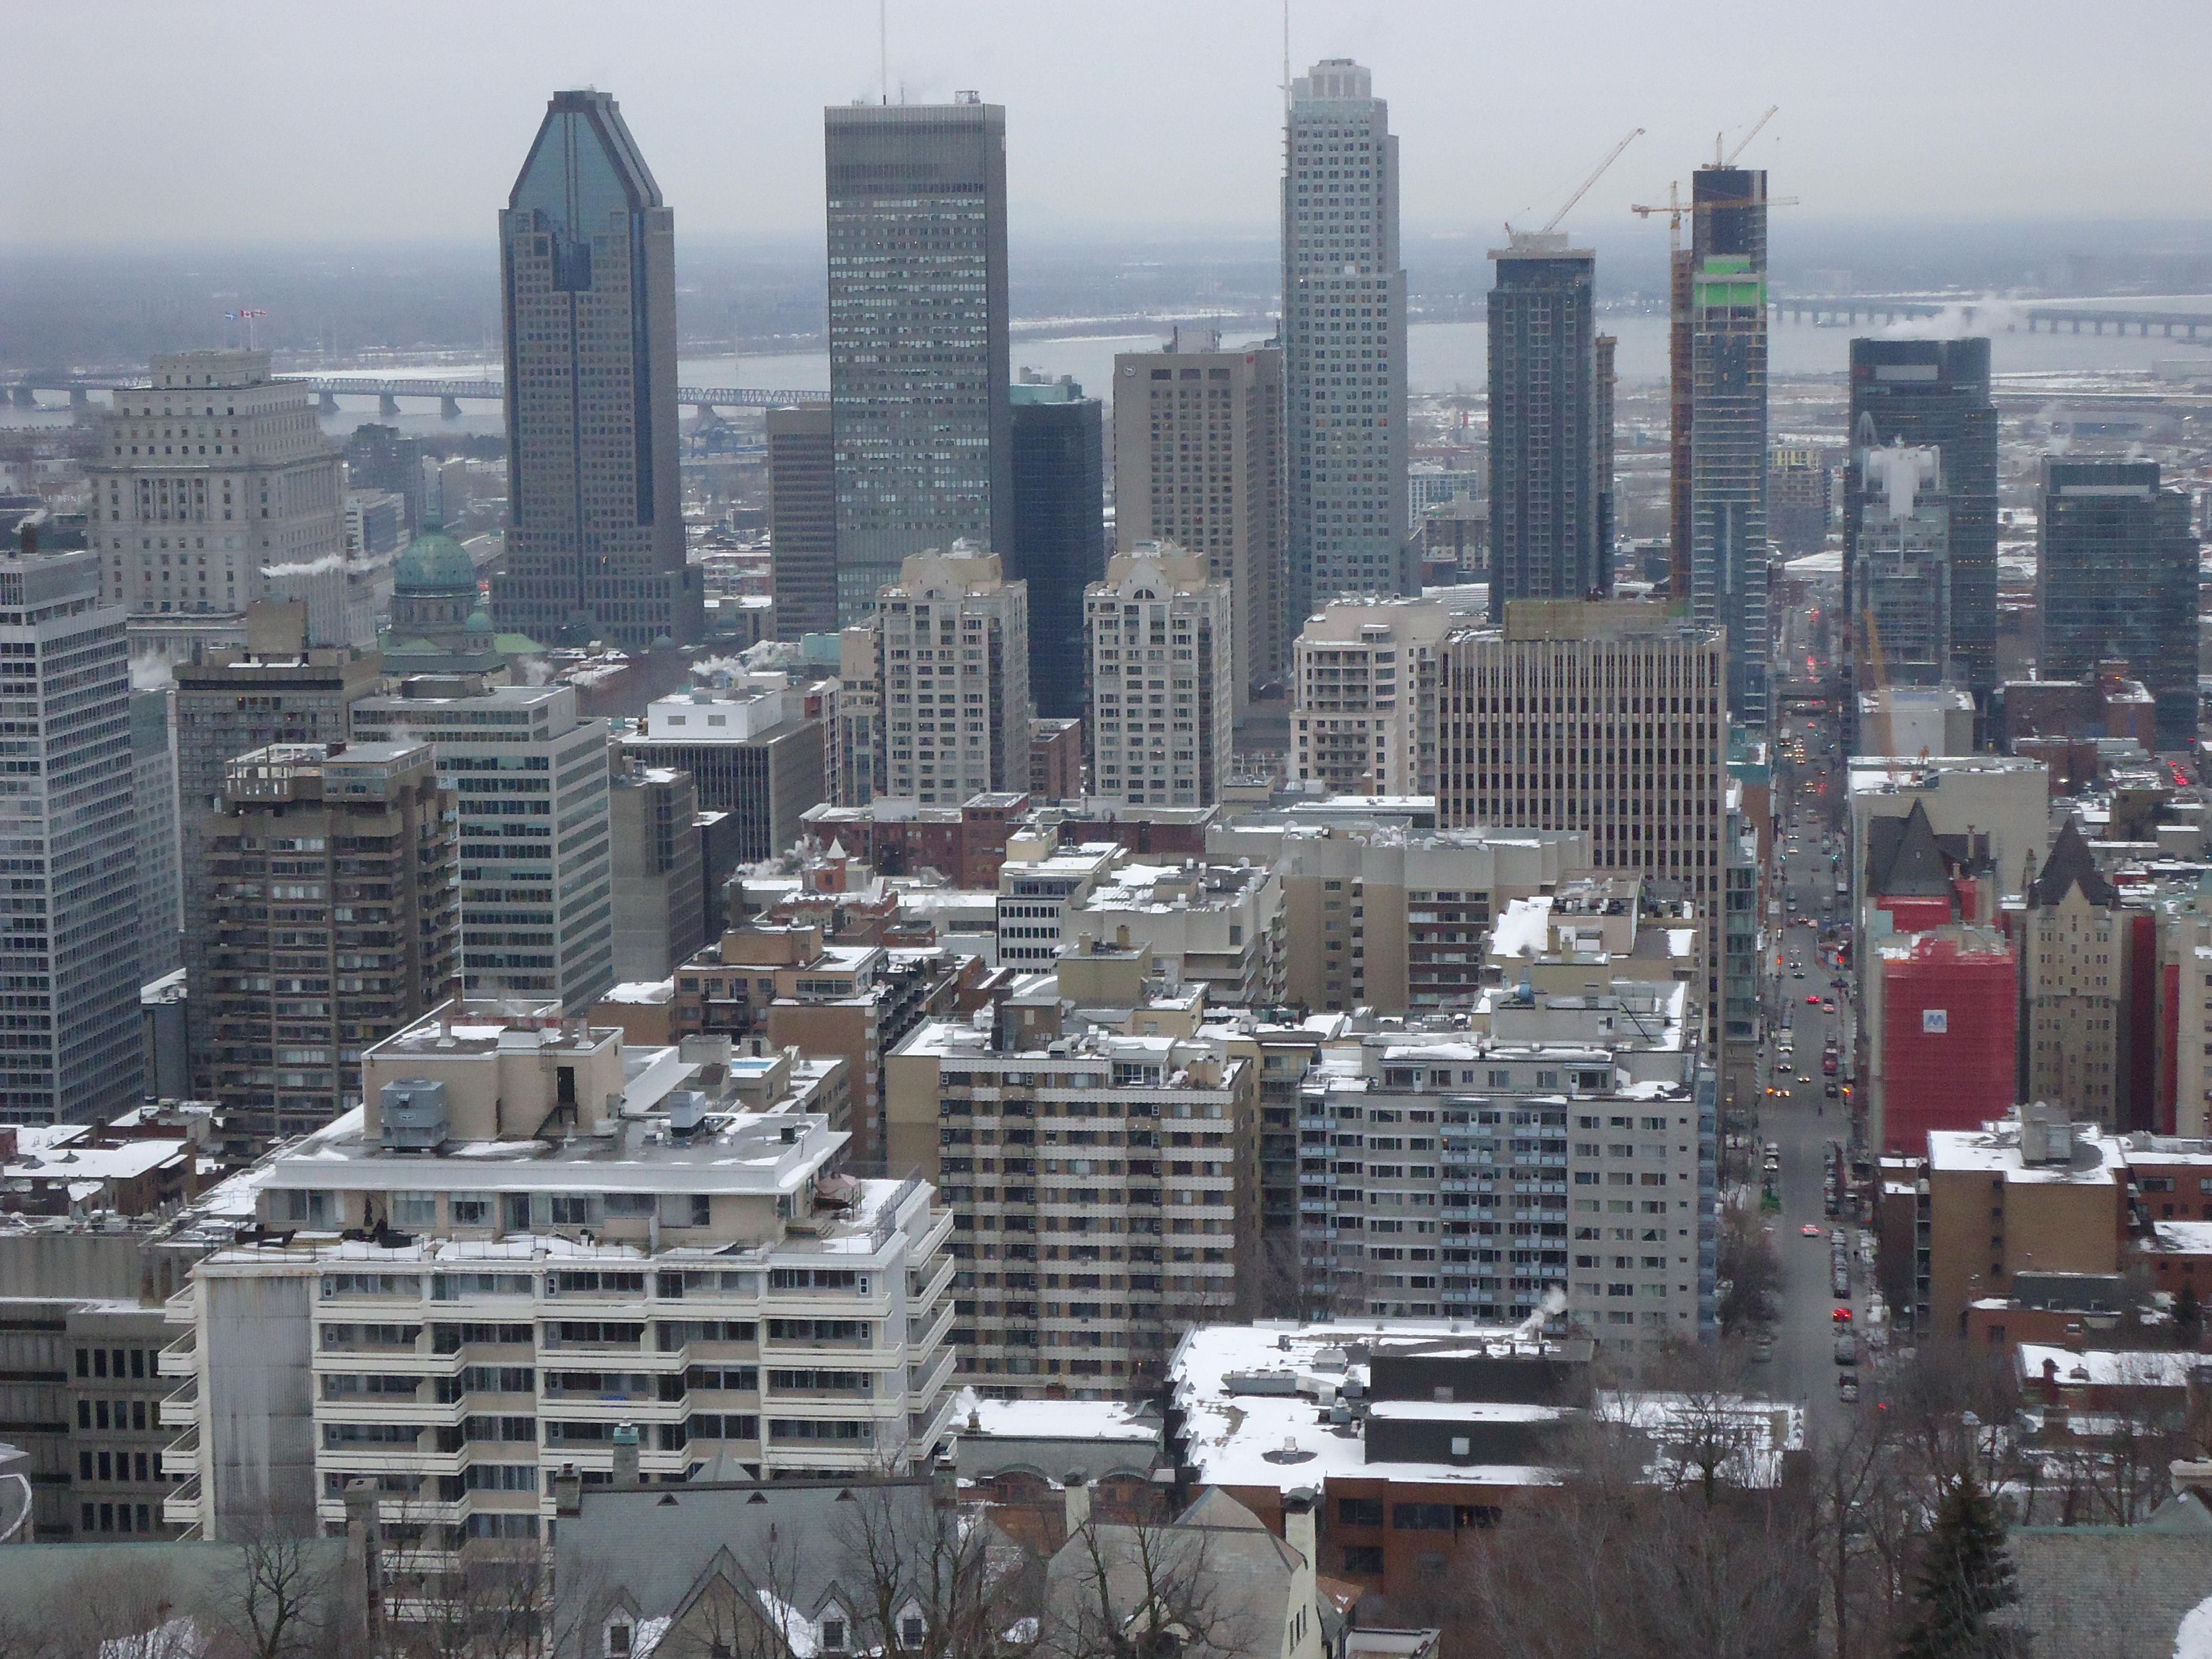 DSC02831 - Canada